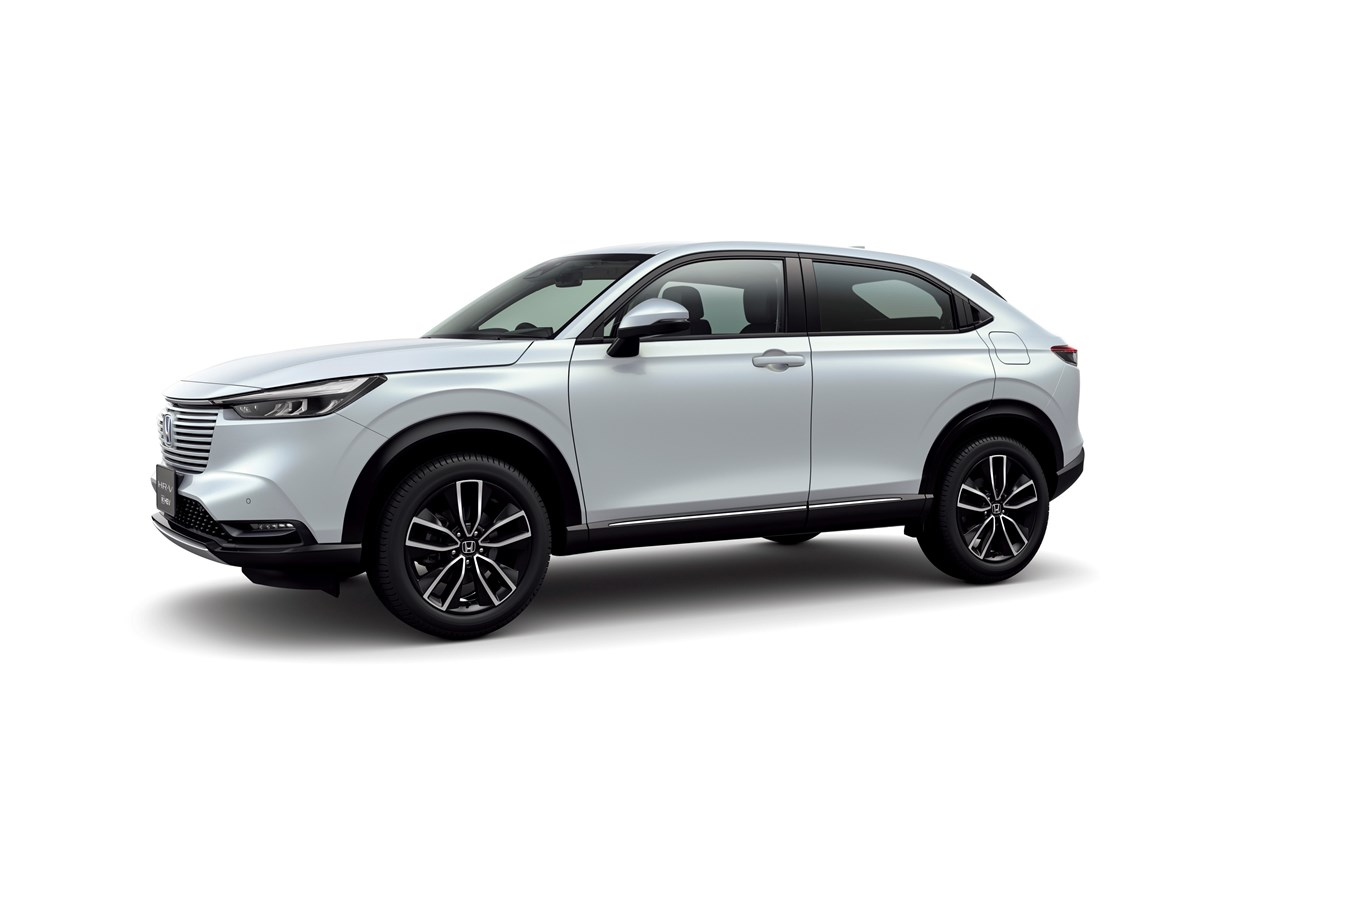 Honda svela in anteprima globale il nuovissimo HR-V ibrido